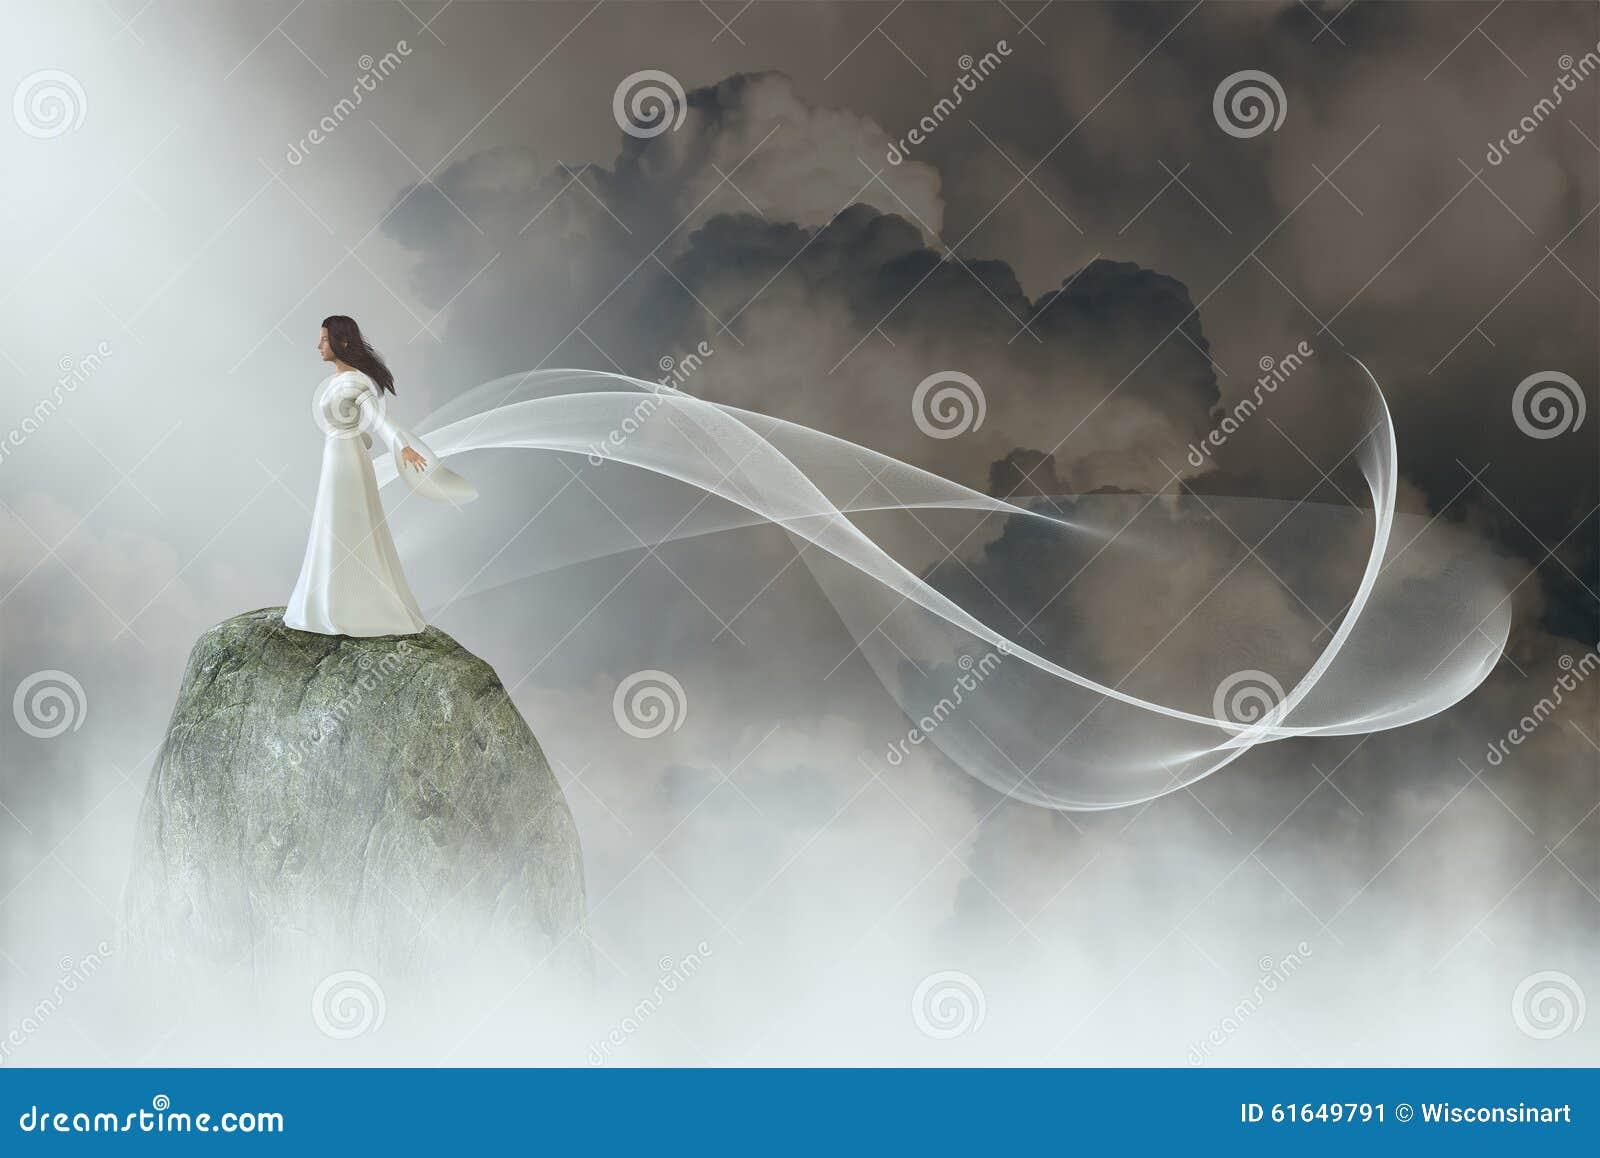 Pace, speranza, natura, bellezza, amore